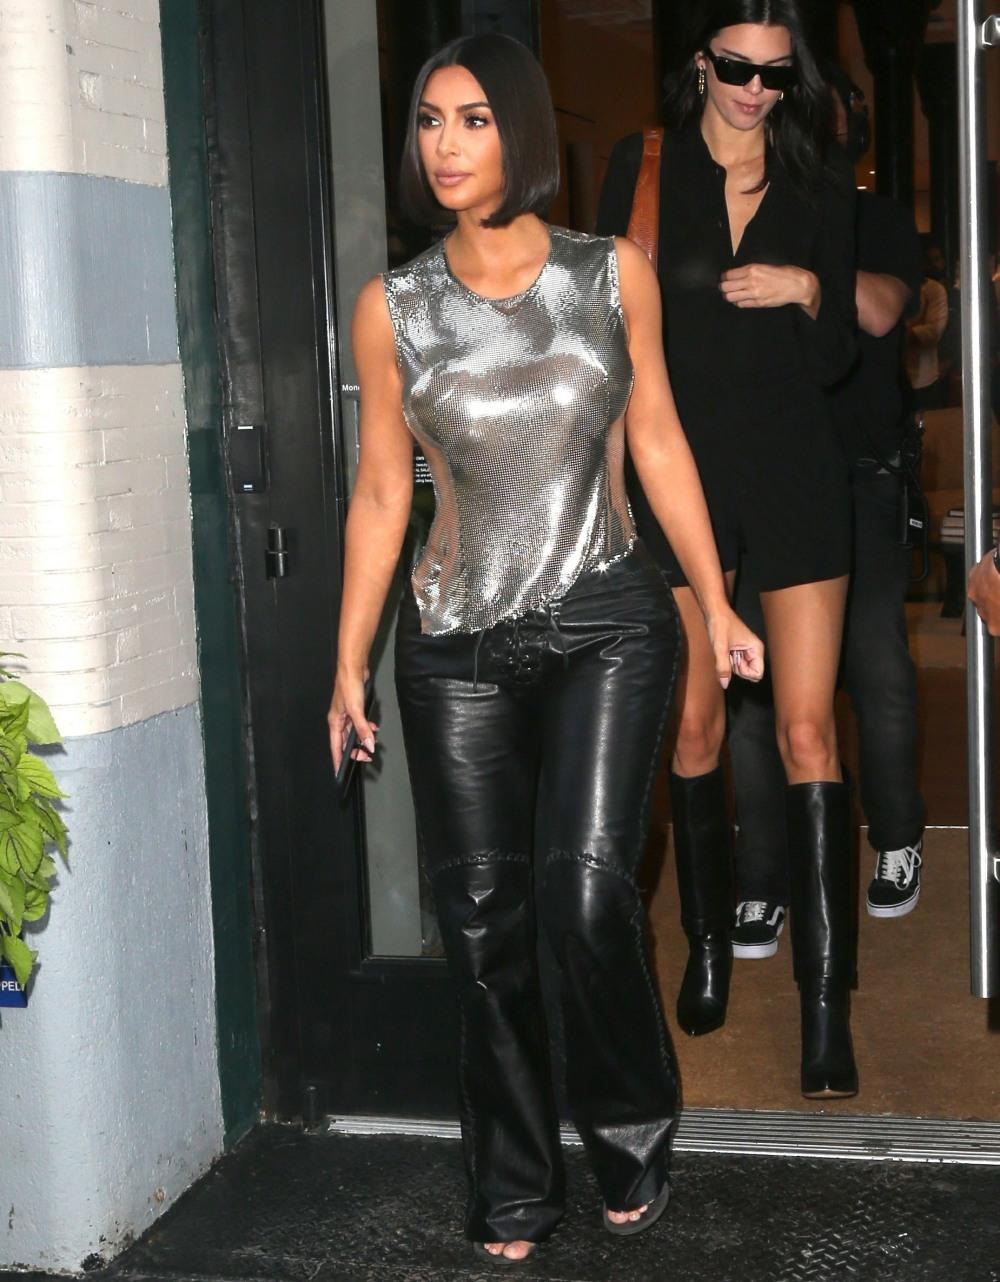 Kim Kardashian, Kendall Jenner, and Jonathan Cheban go shopping during NYFW